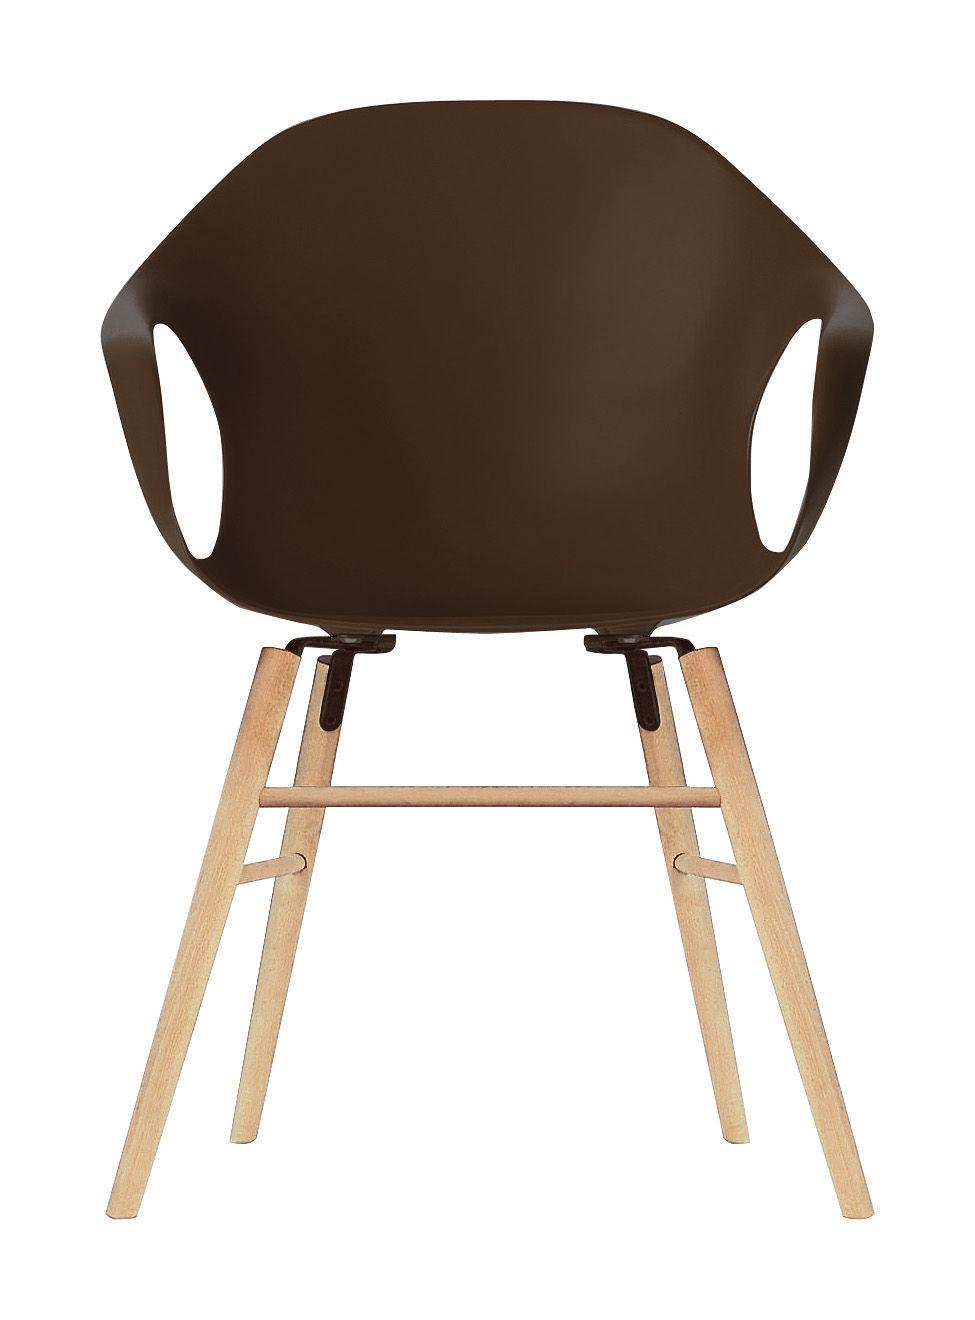 Möbel - Stühle  - Elephant Wood Sessel - Kristalia - Braun - Buchenfurnier, lackiertes Polyurhethan